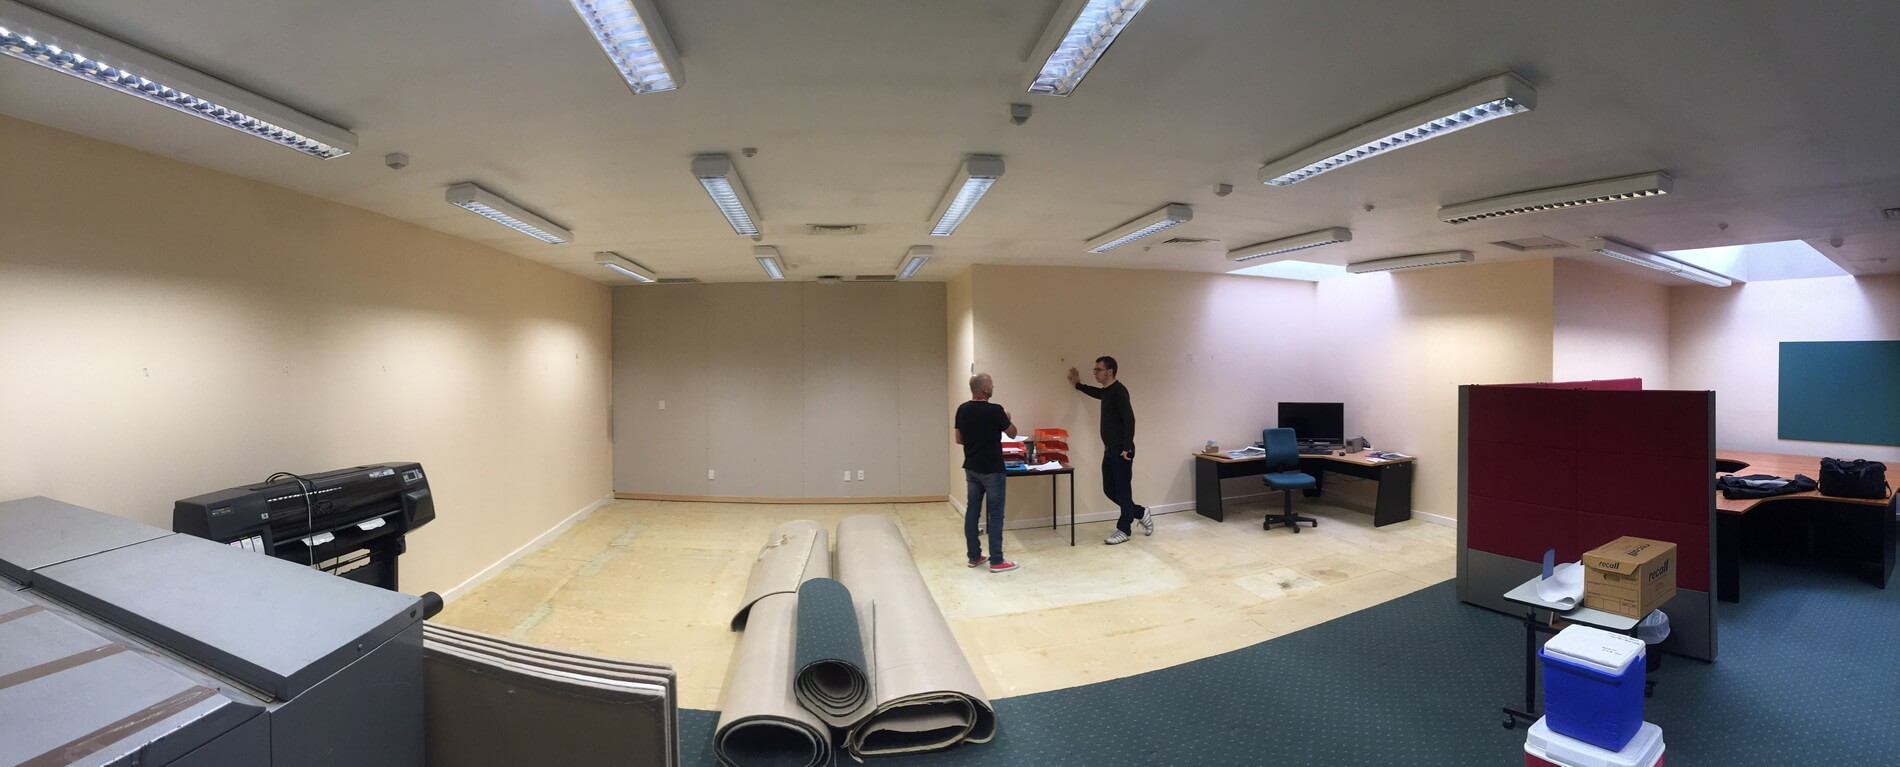 Sound Proofed Media Room Under Construction